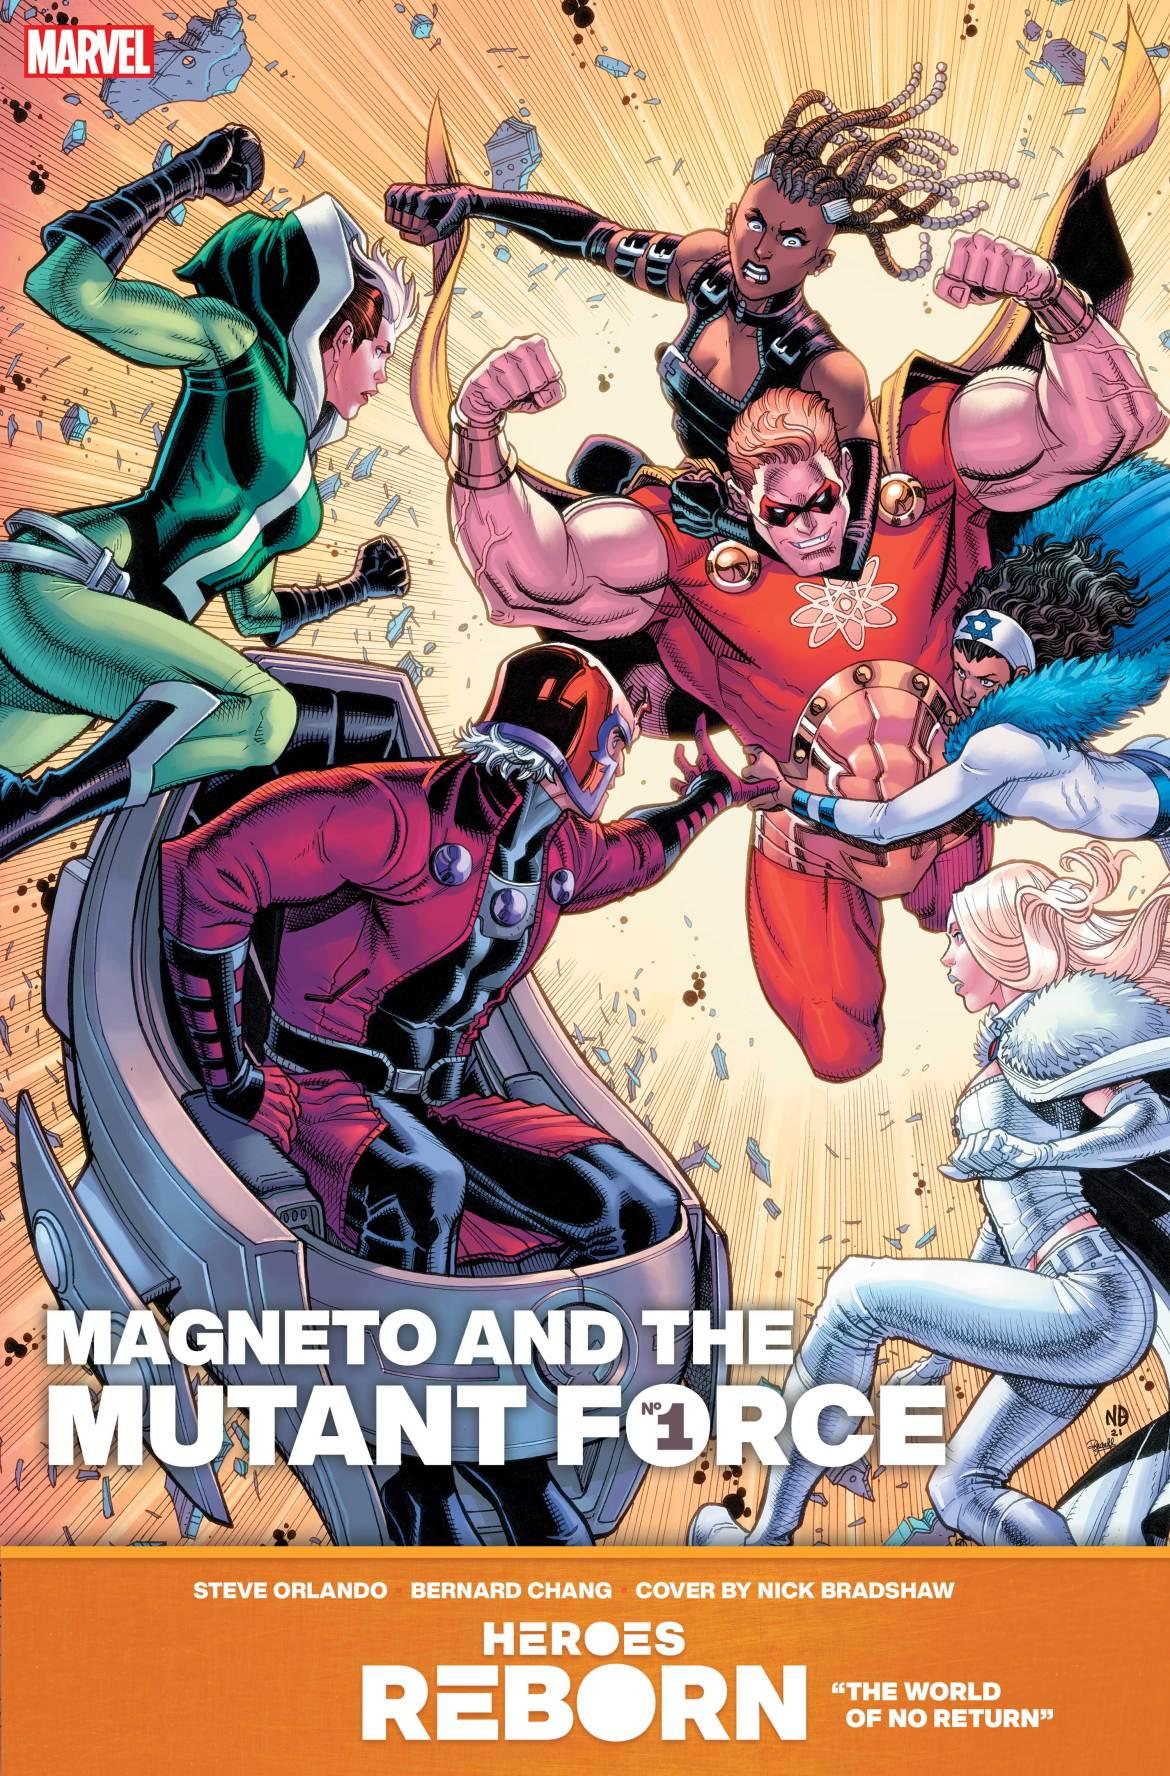 REBORN_MagnetoMutantForce-1 Marvel Comics May 2021 Solicitations